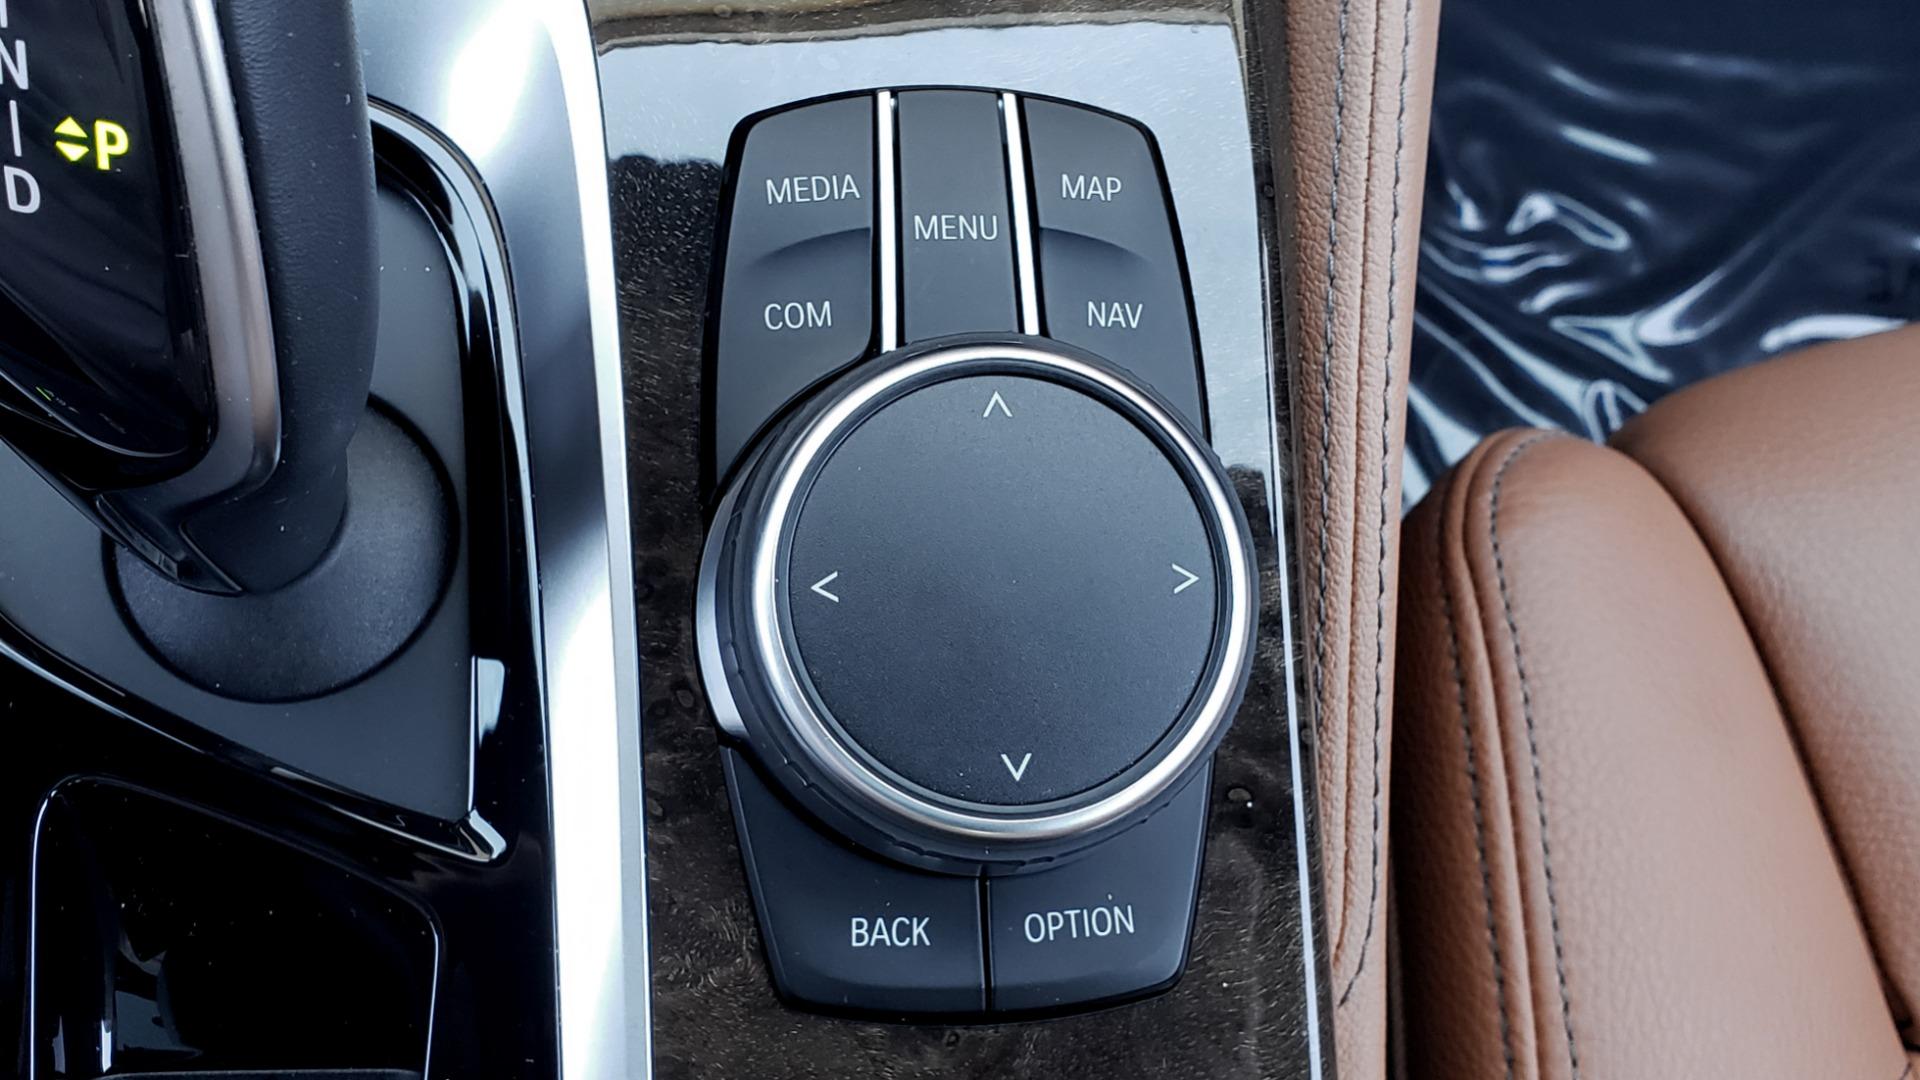 Used 2018 BMW 5 SERIES 540I M-SPORT / DRVR ASST / EXEC PKG / NAV / SUNROOF / HUD / REARVIEW for sale Sold at Formula Imports in Charlotte NC 28227 52